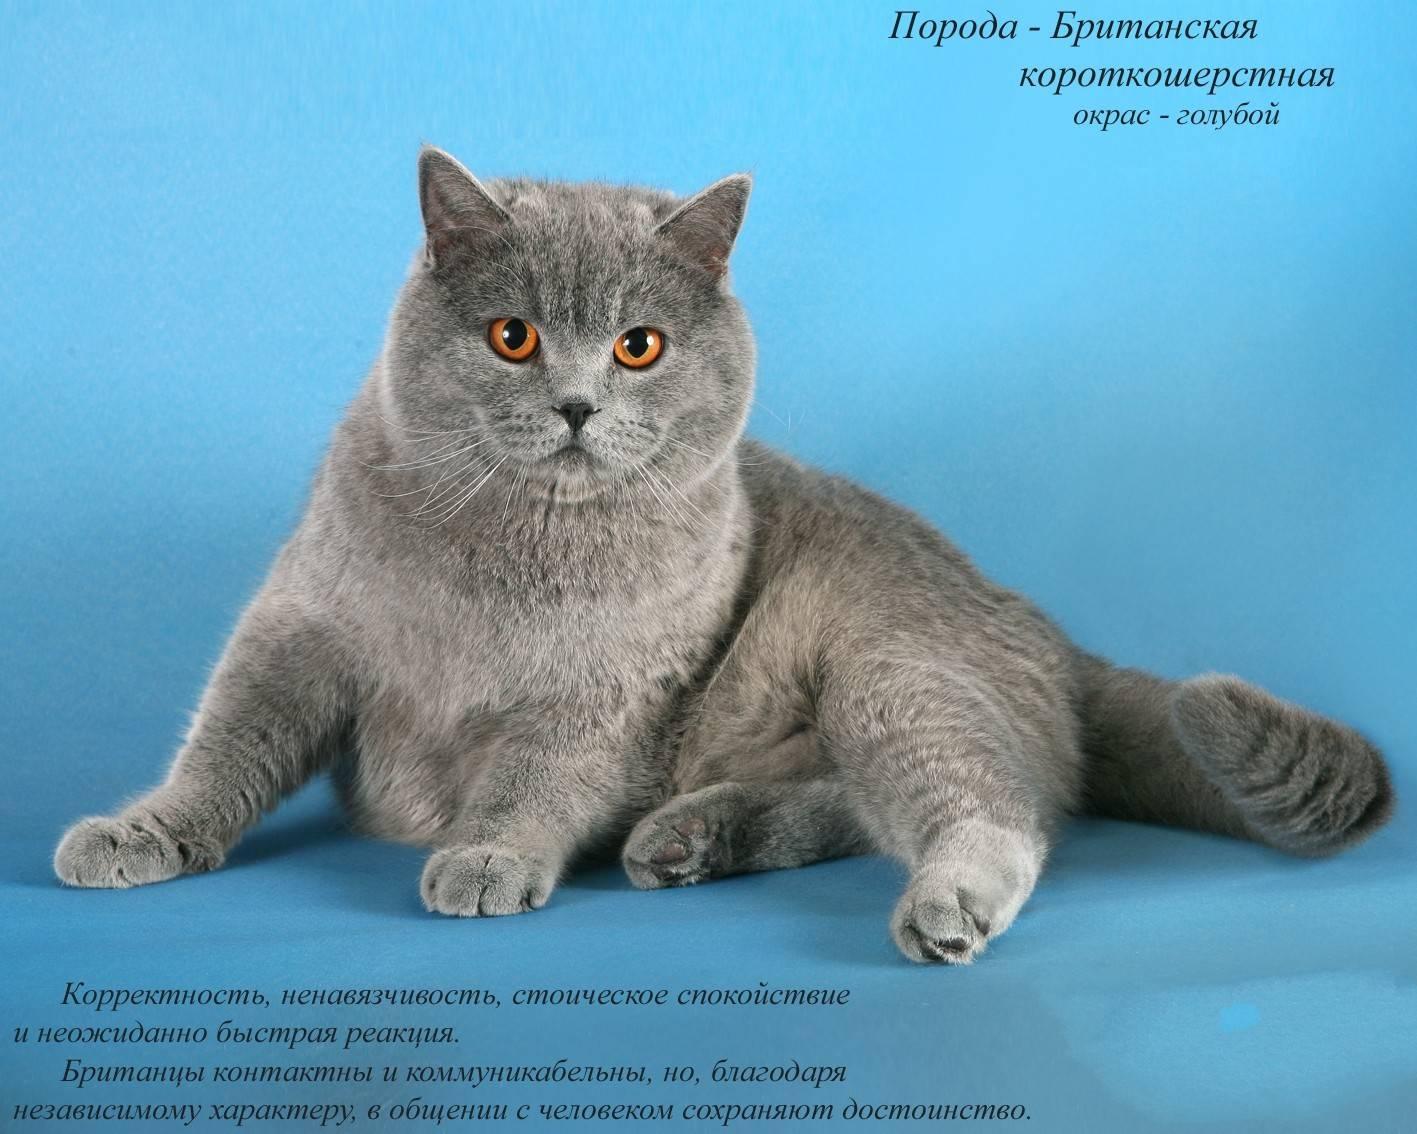 Британские короткошерстные коты: характеристика, фото